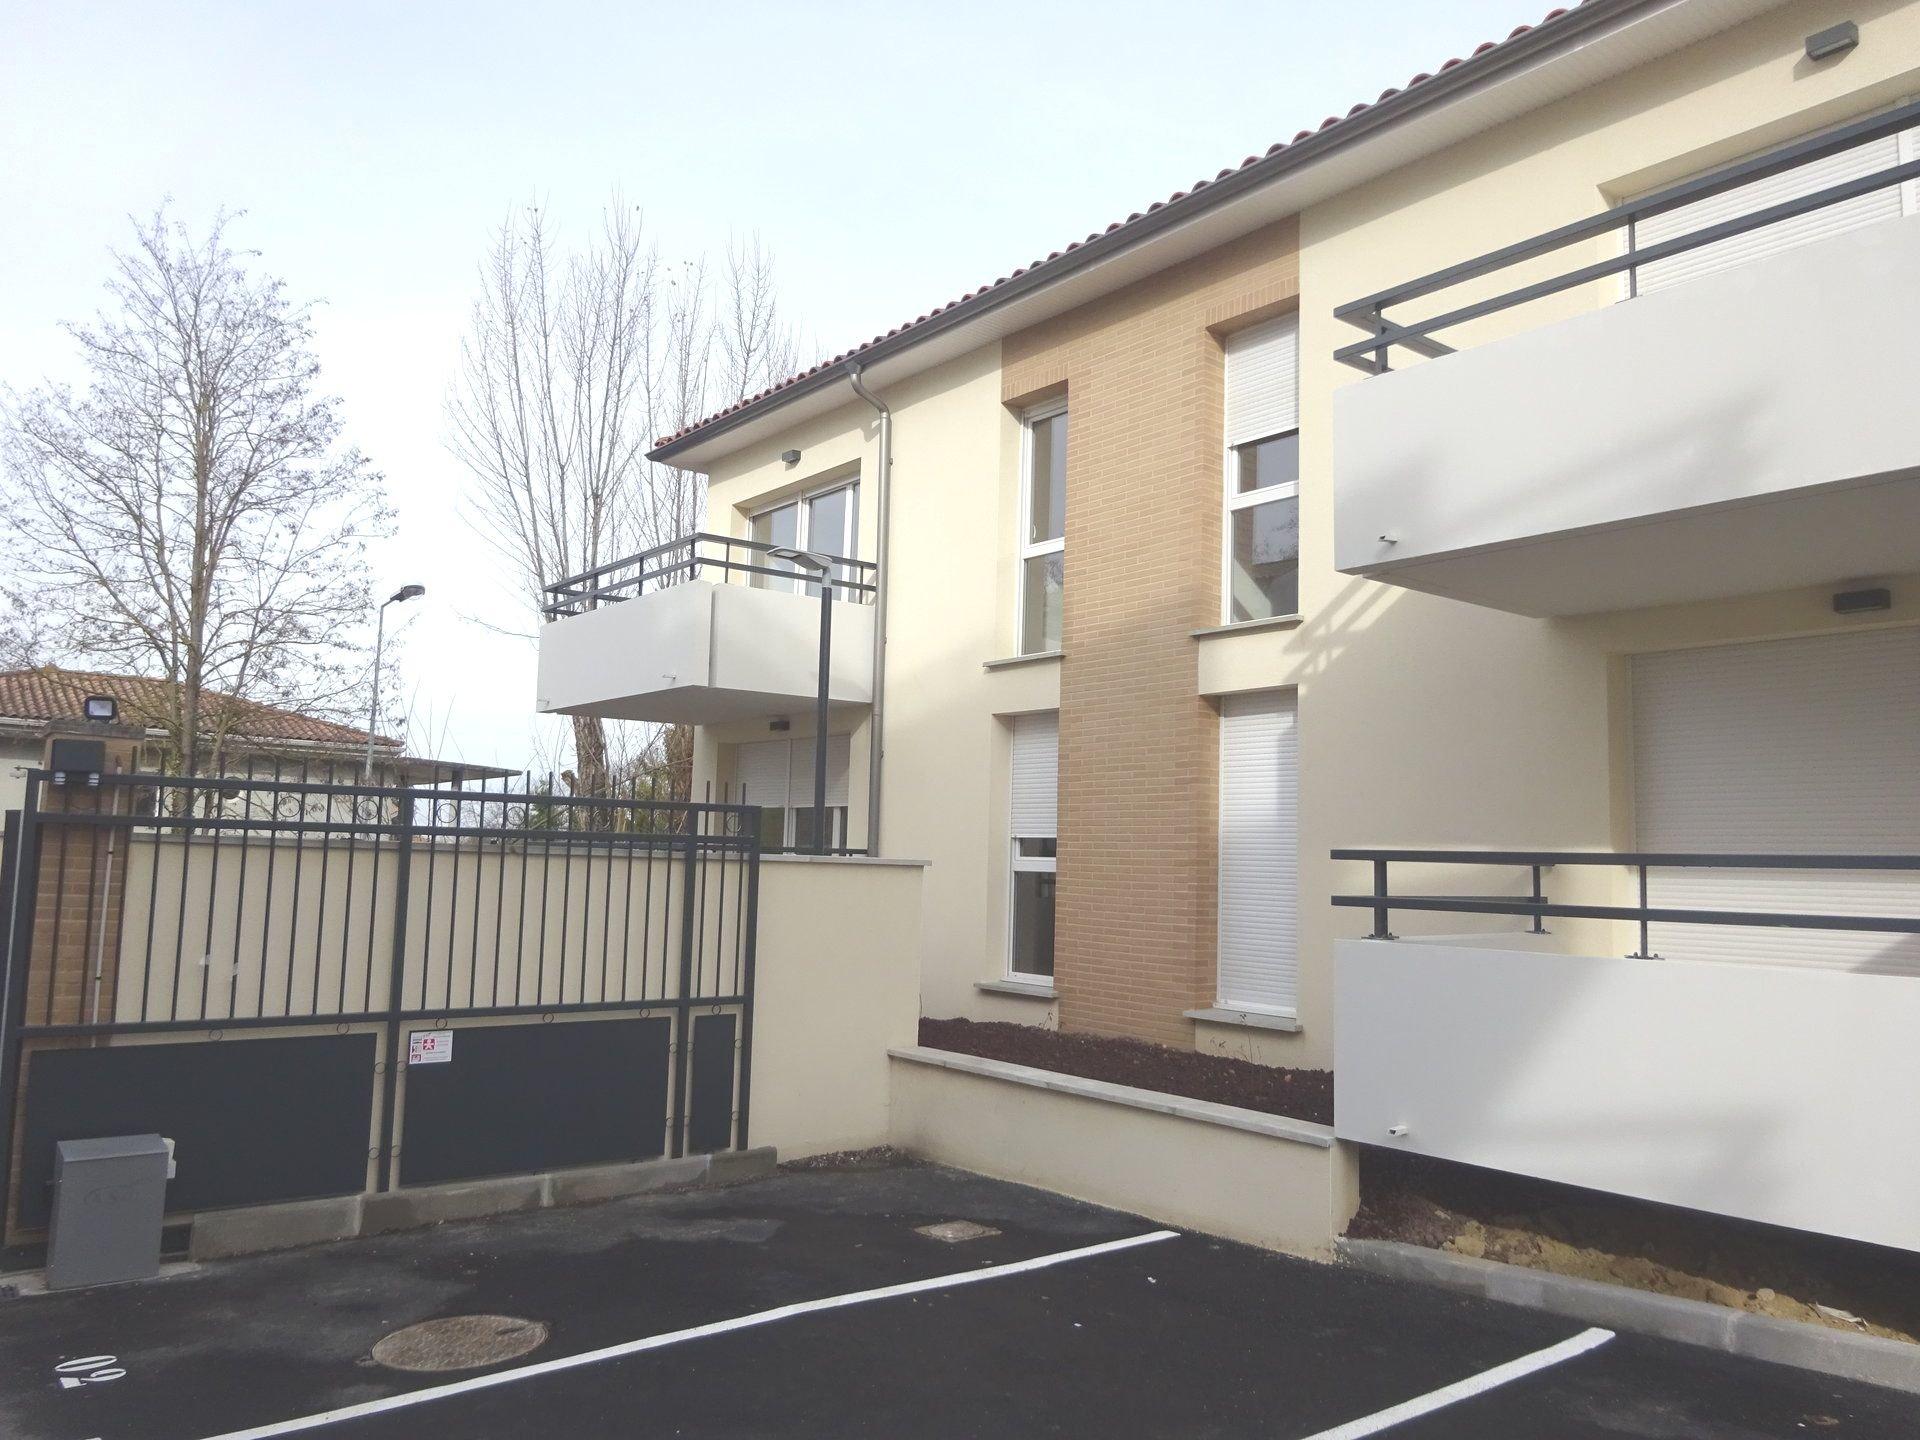 Alquiler Piso - Saint-Orens-de-Gameville